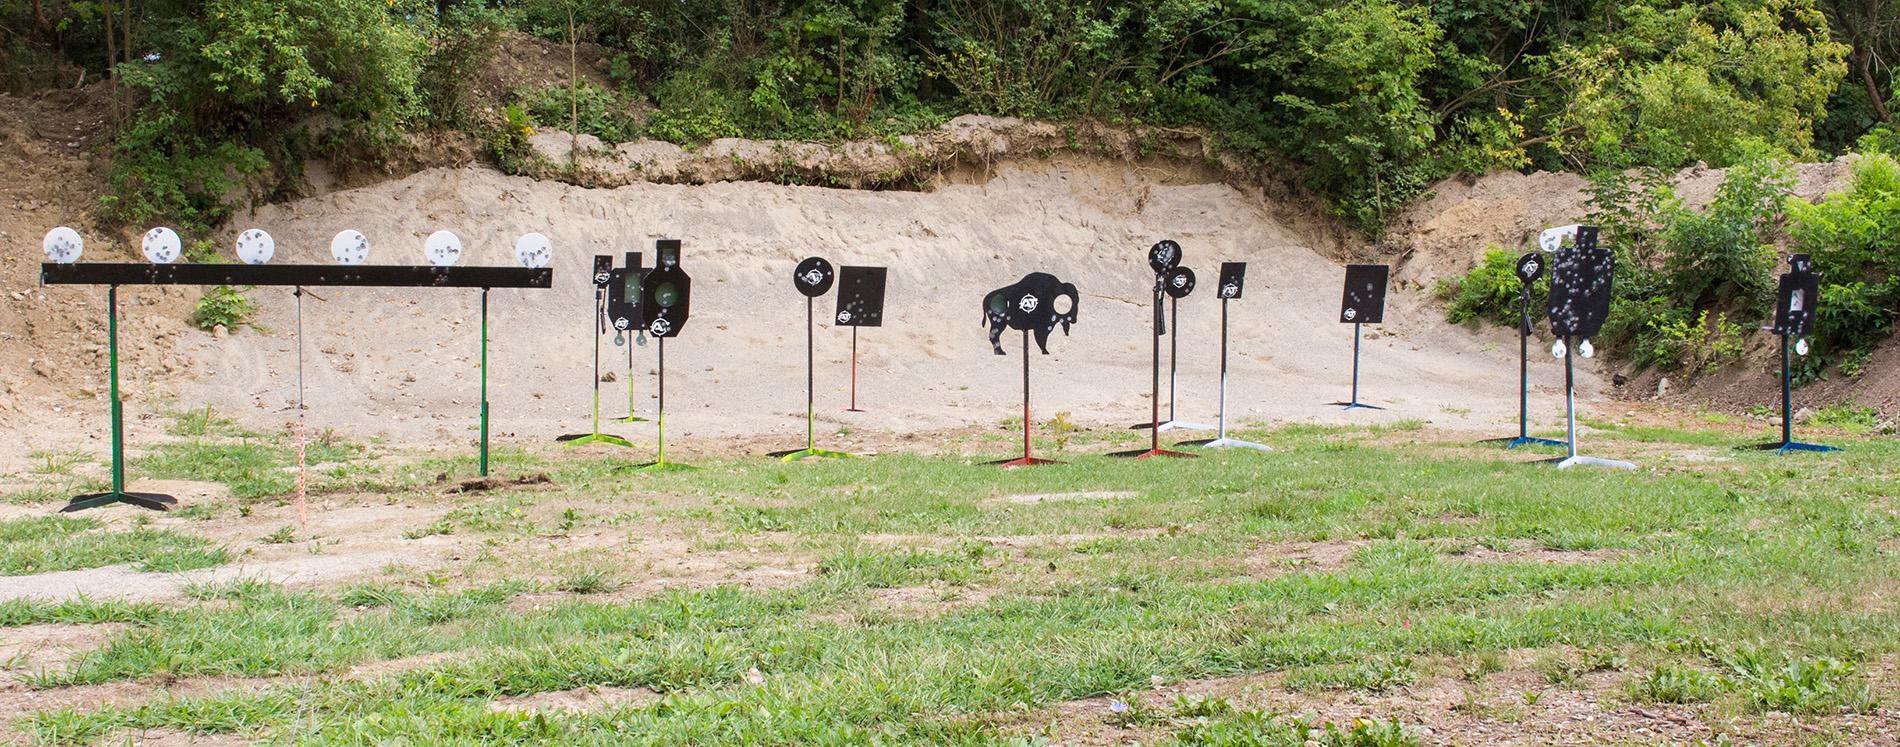 Outdoor Firearms Range, Target shooting